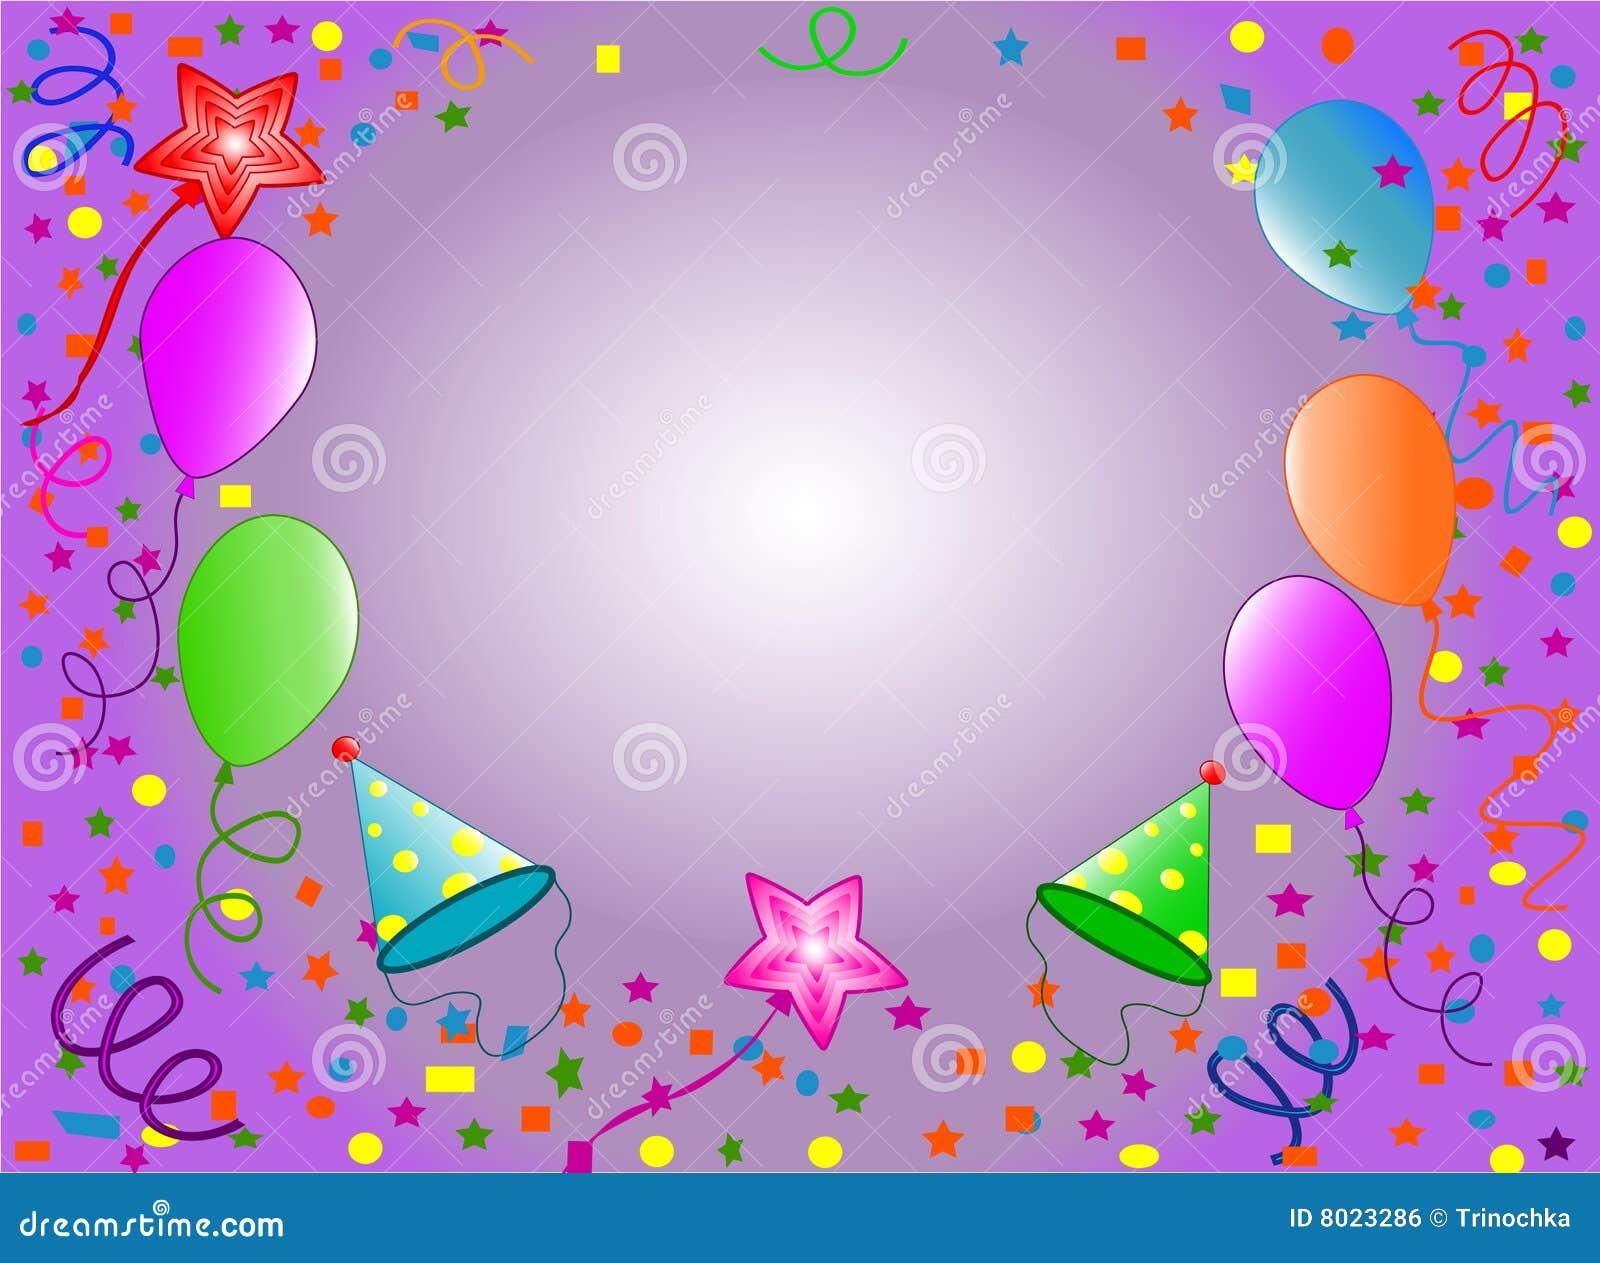 Happy Birthday Background Royalty Free Stock Image - Image: 8023286